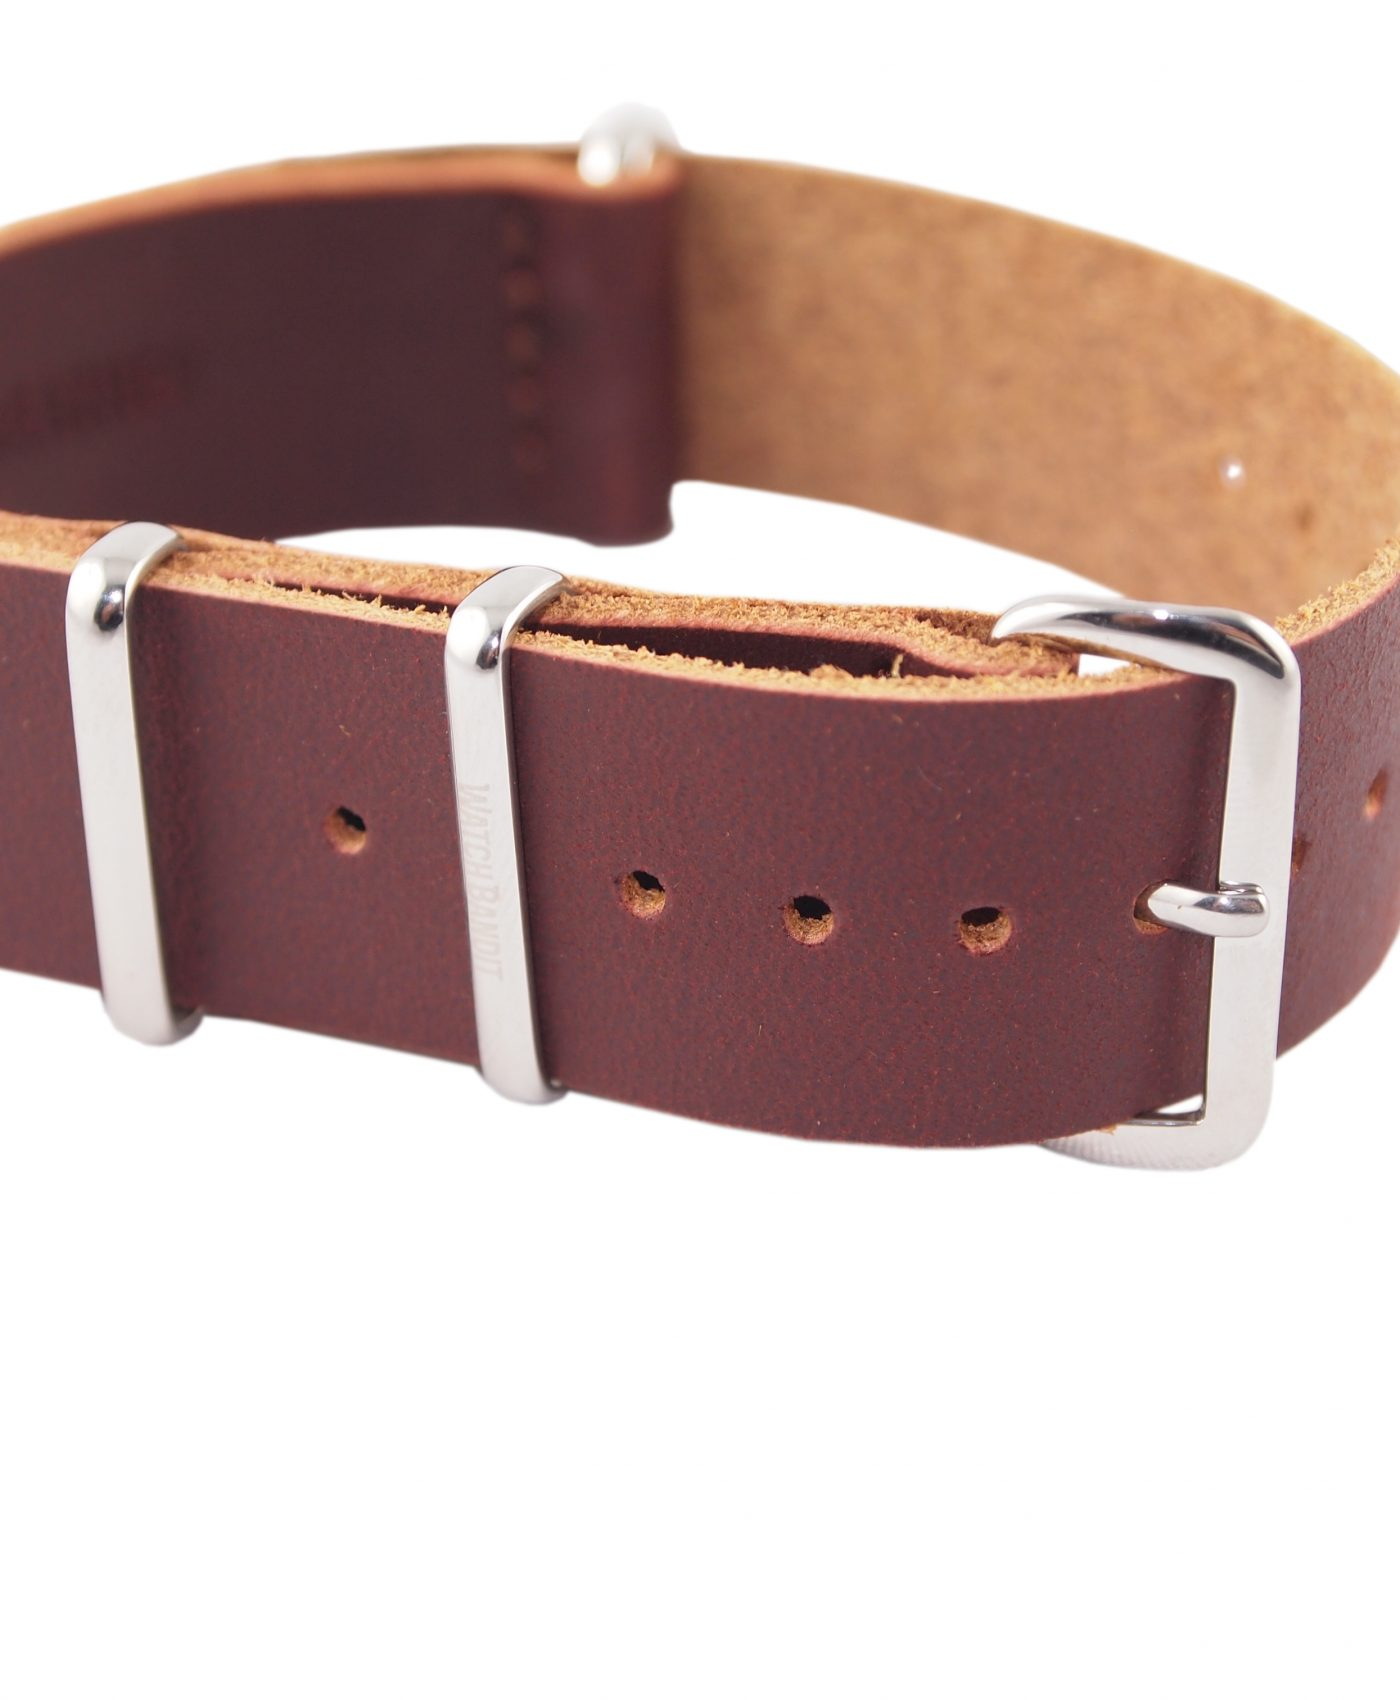 Nato Strap Burgundy Leather WatchBandit